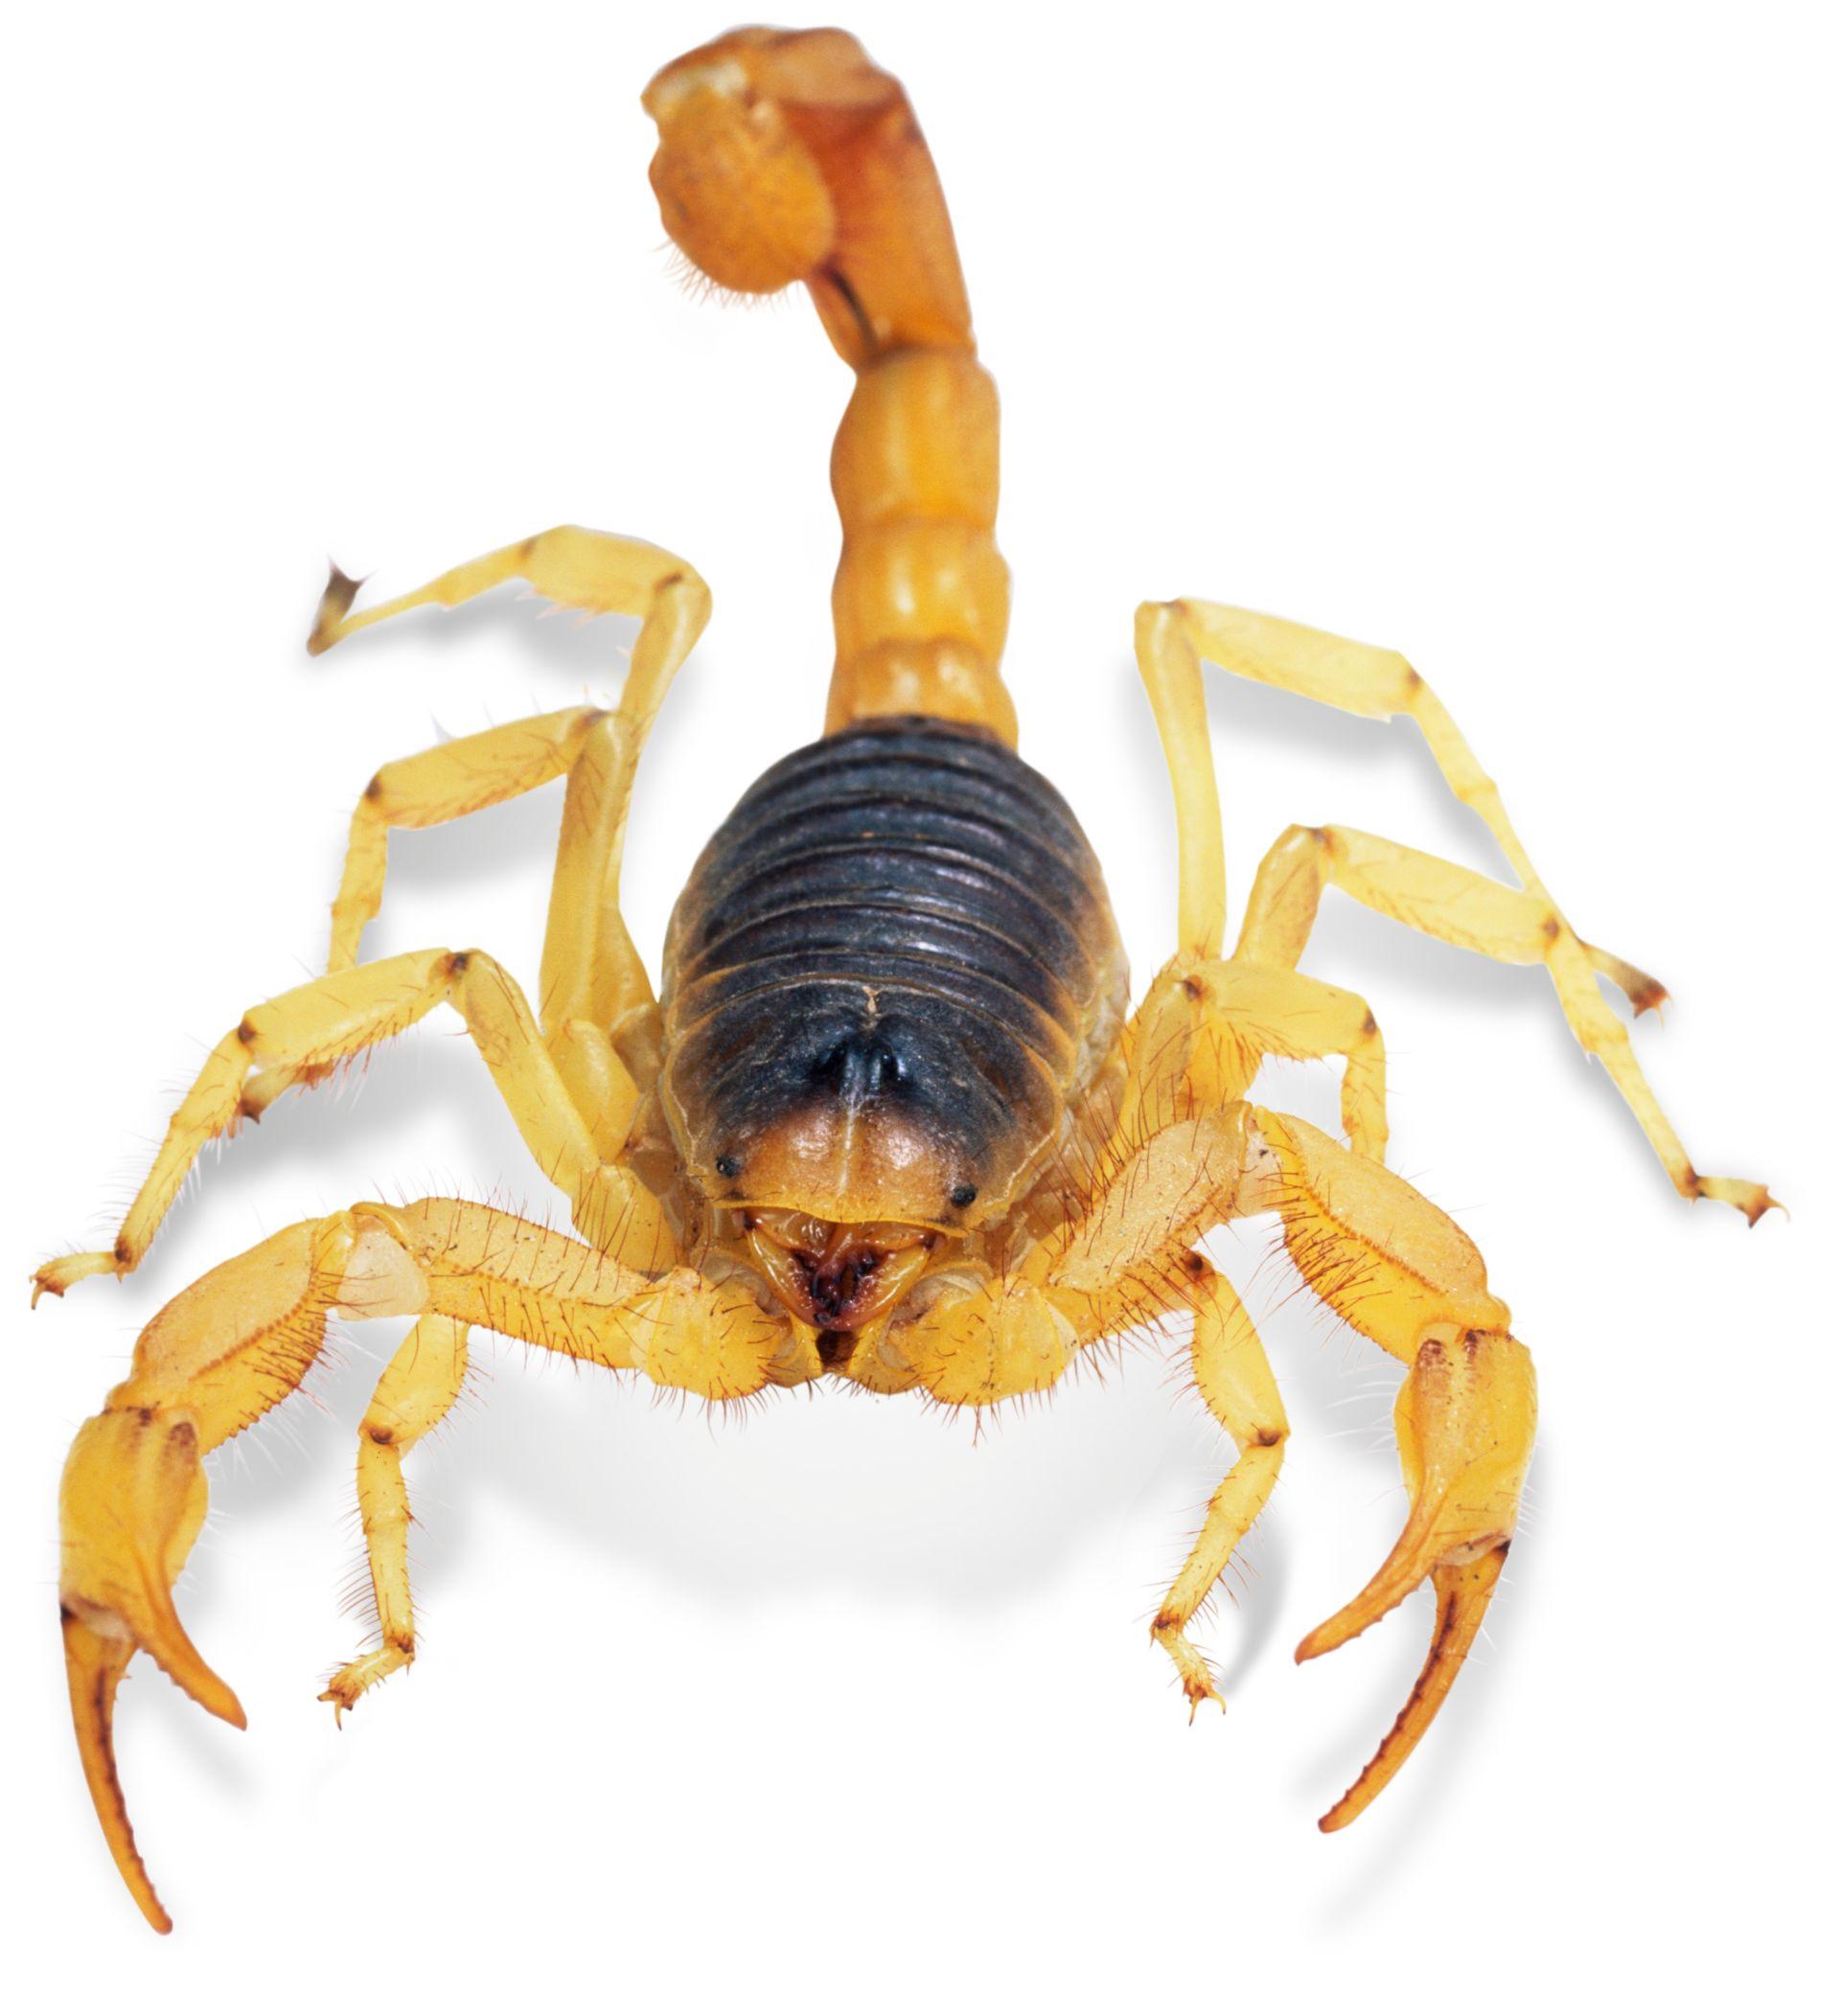 scorpions hairy giant desert